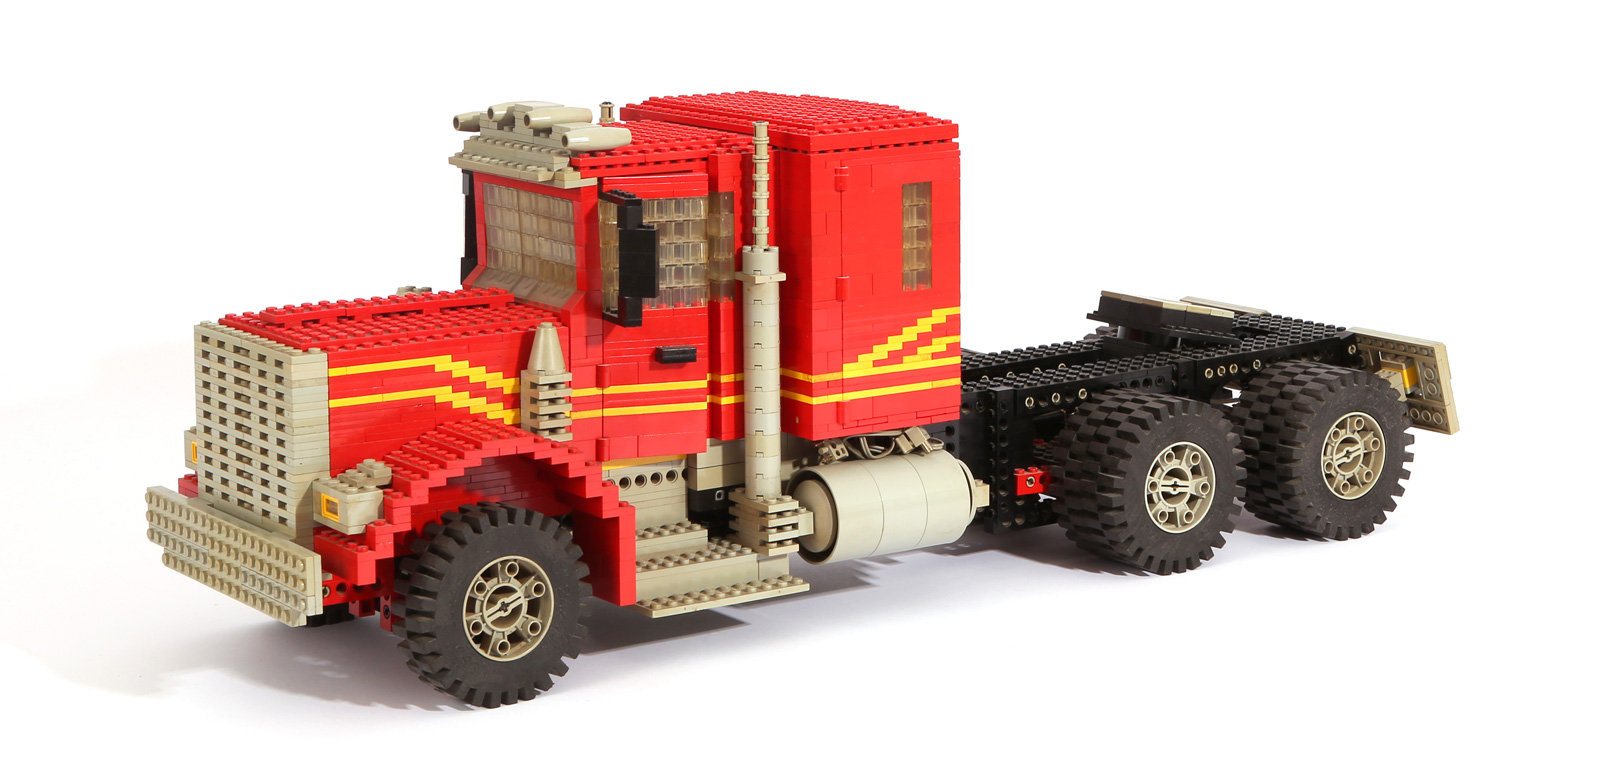 Truck-Peterbuild 359 Conventional (eigene Modelle)